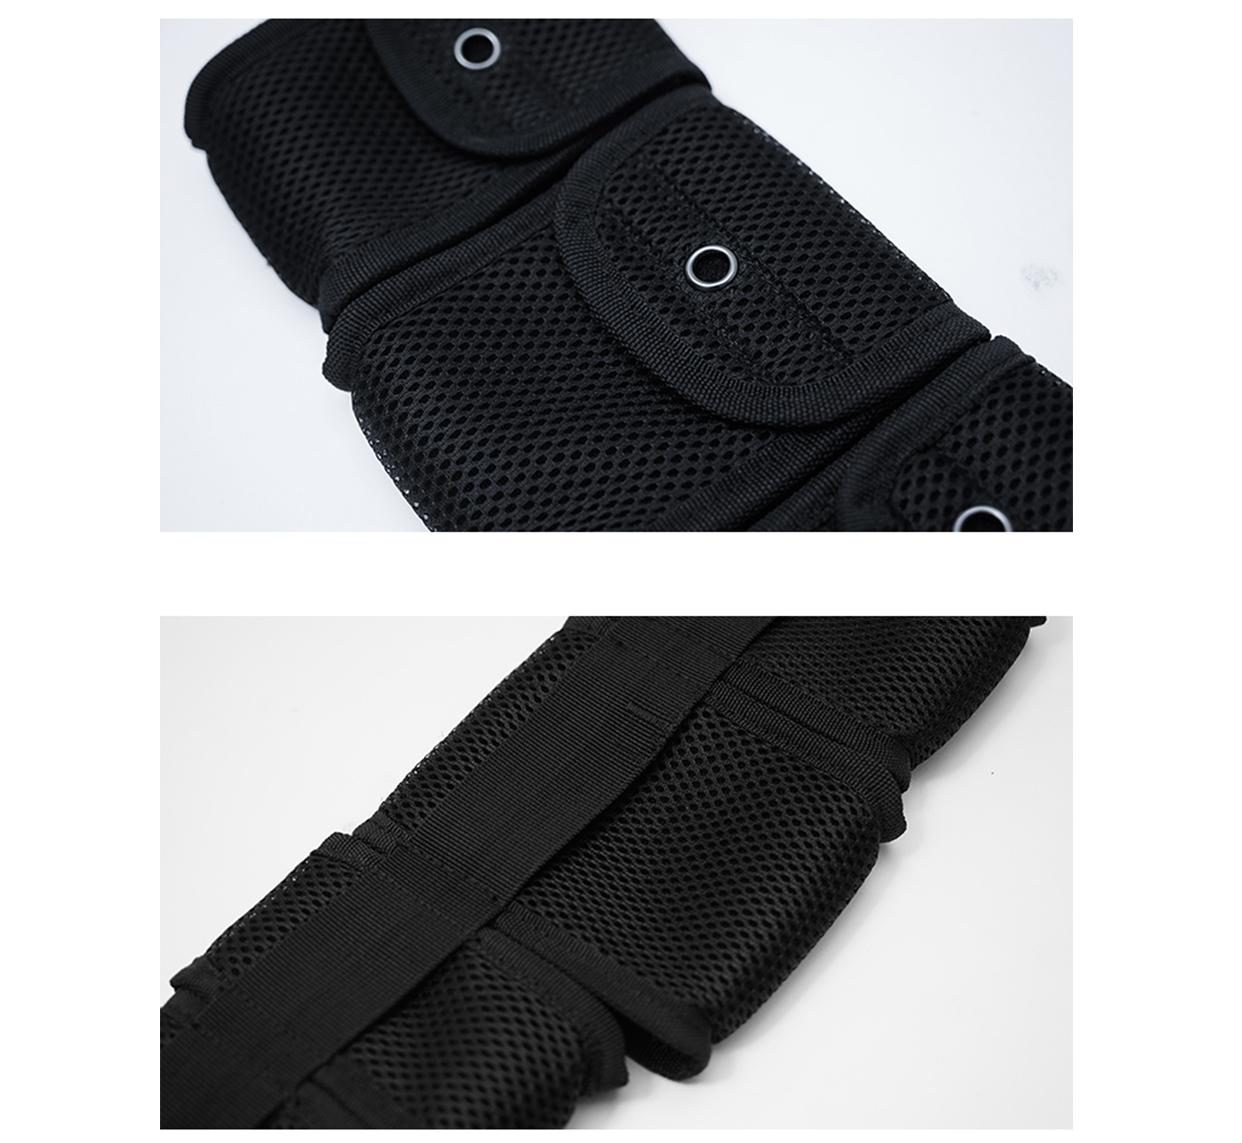 3e15db60d Hiphop Tactical Waist Bag Waterproof Oxford Molle Men Women Fanny Pack  Fashion Chest Bag Men Crossbody Bags Military Waist PackUSD 12.95/piece